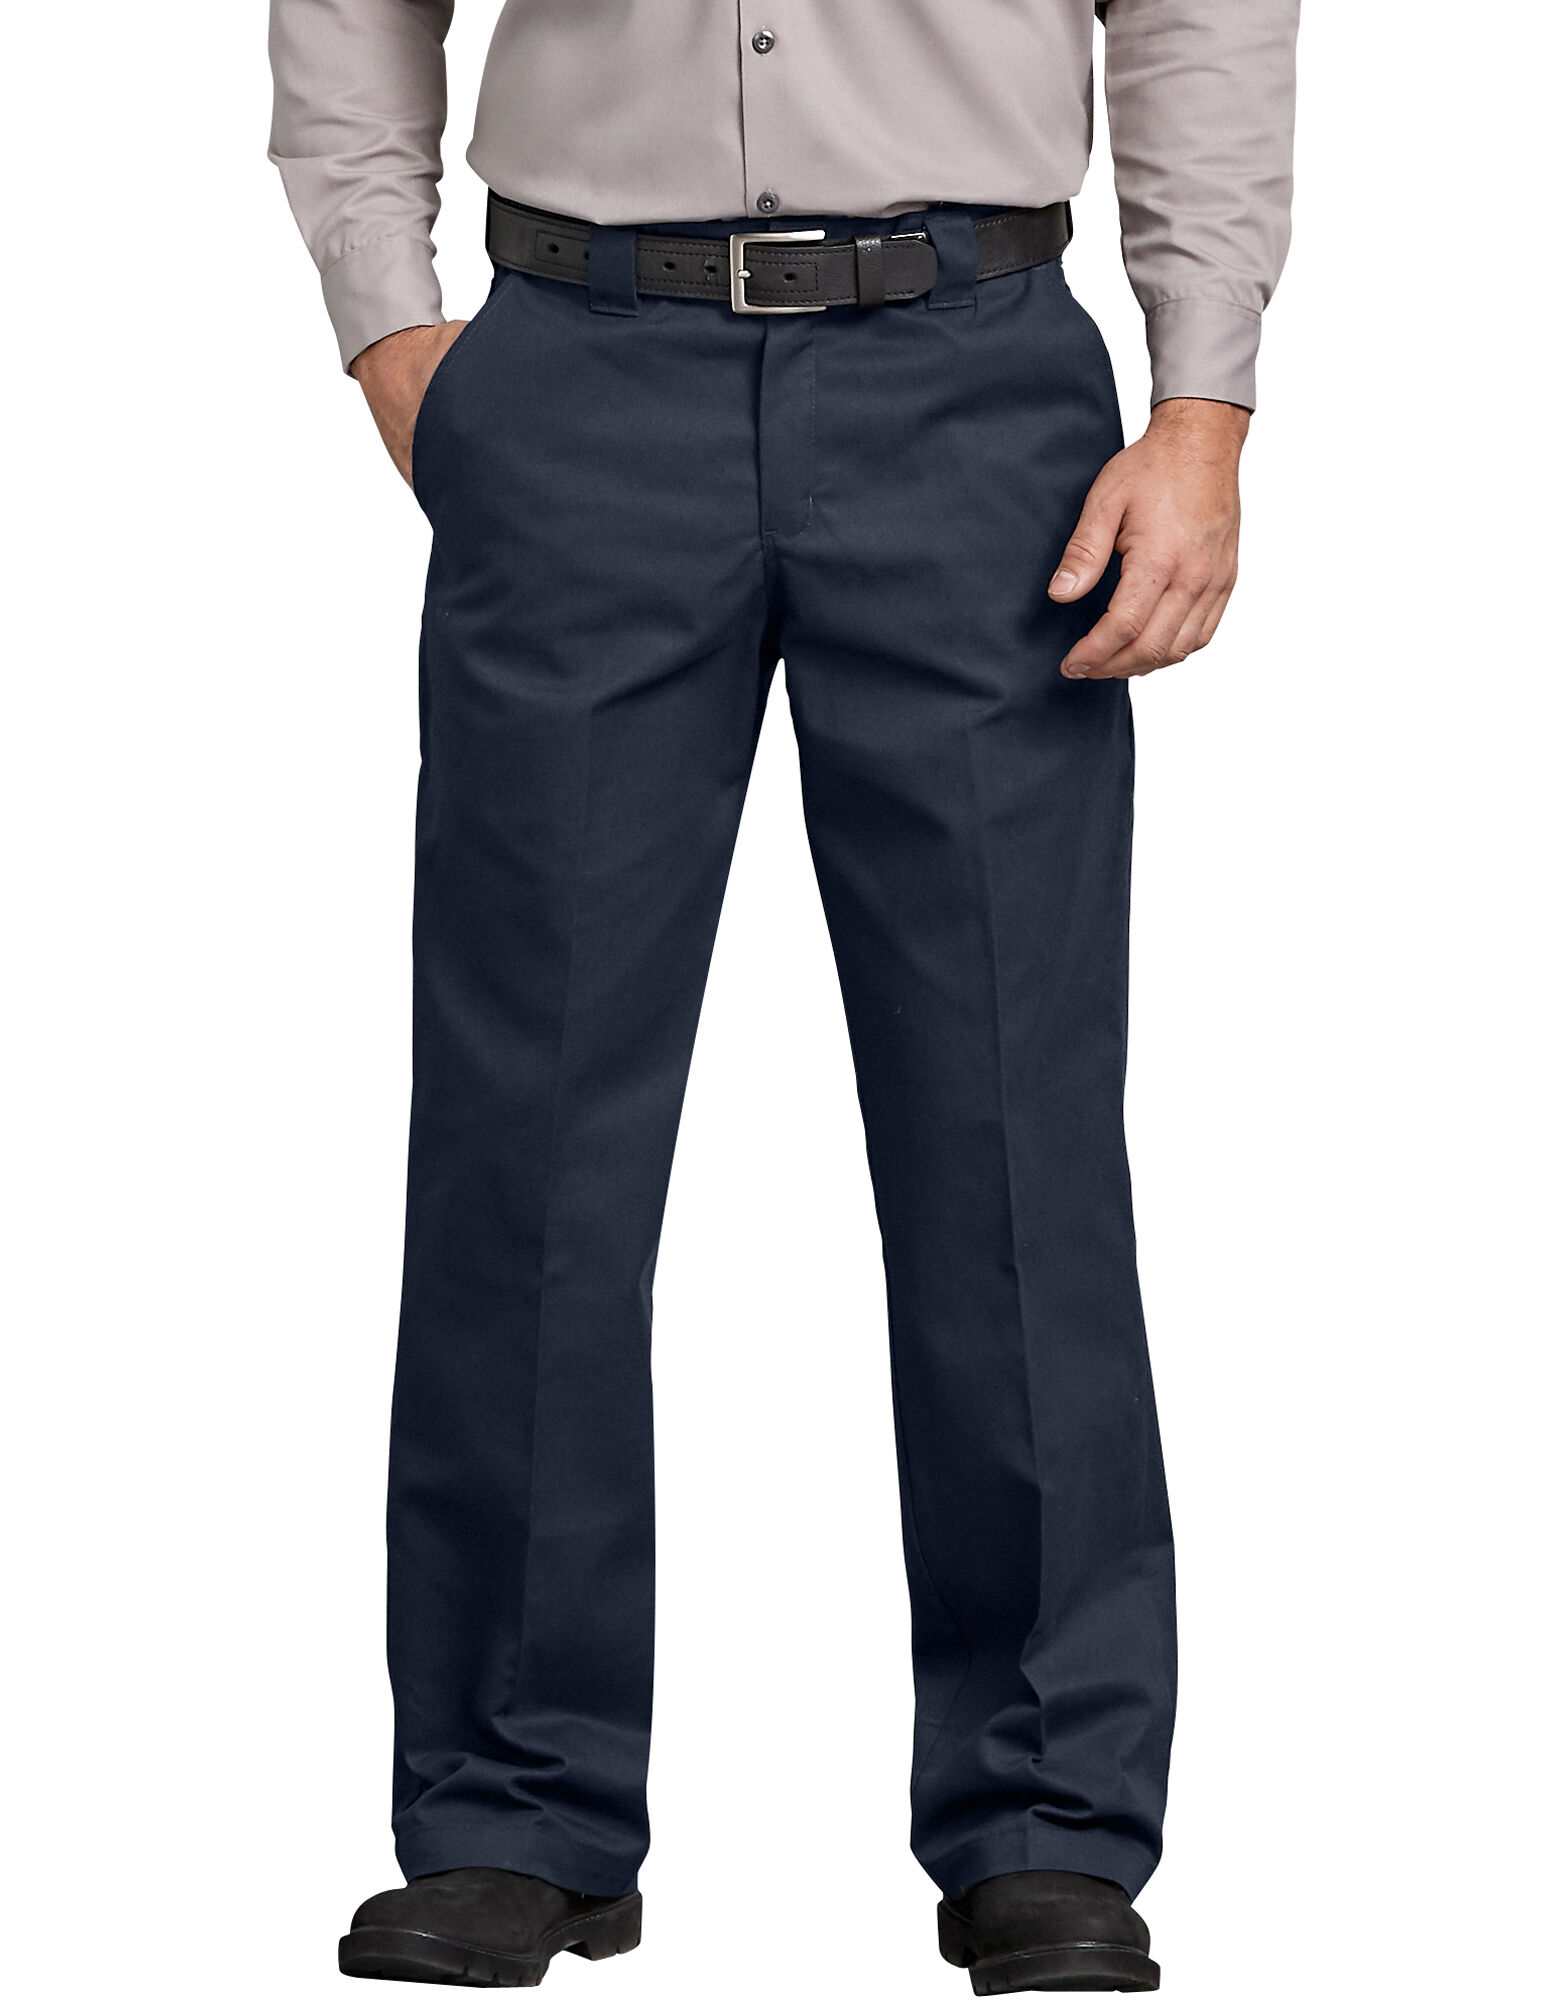 FLEX Relaxed Fit Straight Leg Twill Comfort Waist Pants-Dickies Canada